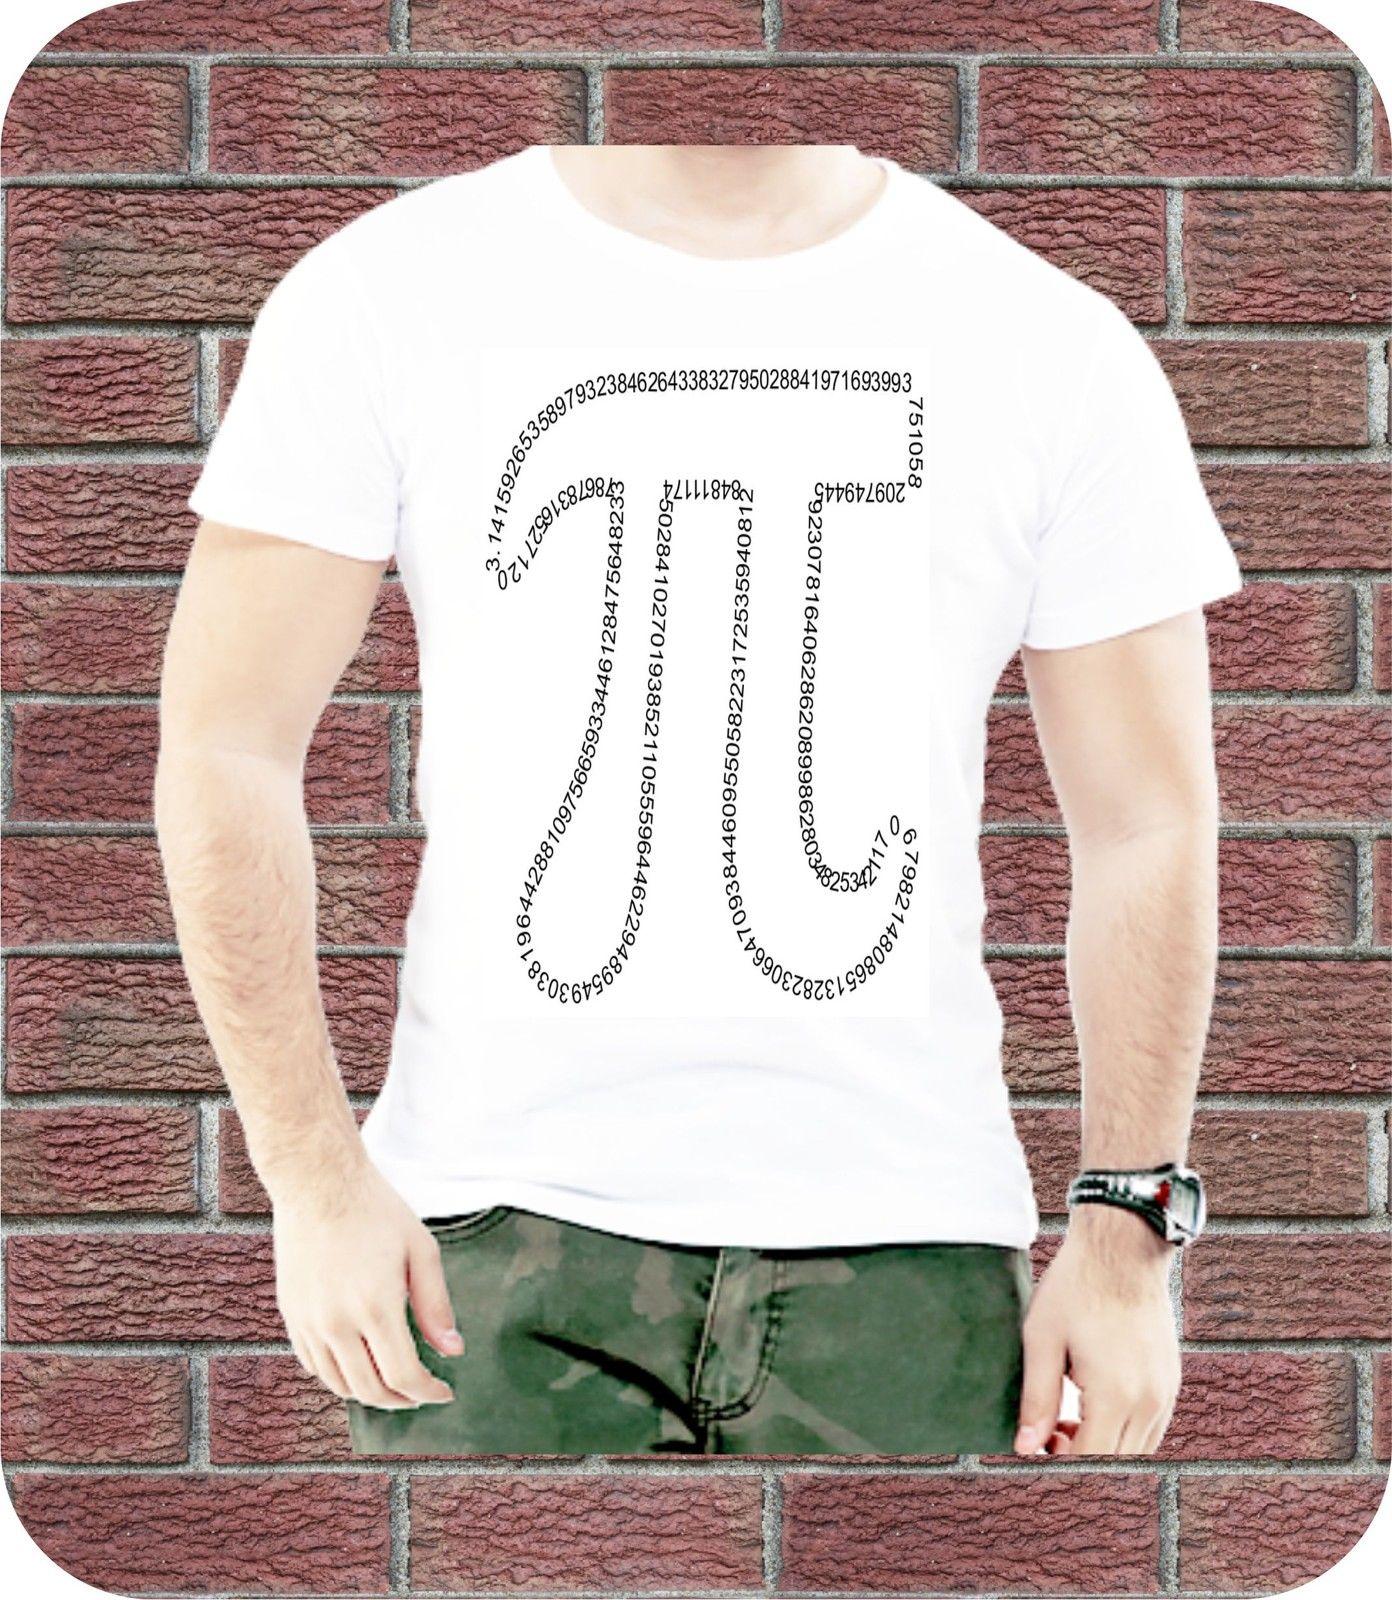 Pi Maths Number Mathematical Greek Letter Men T Shirt Casual Summer Present 3XL New Fashion Mens Short Sleeve Cotton T Shirts